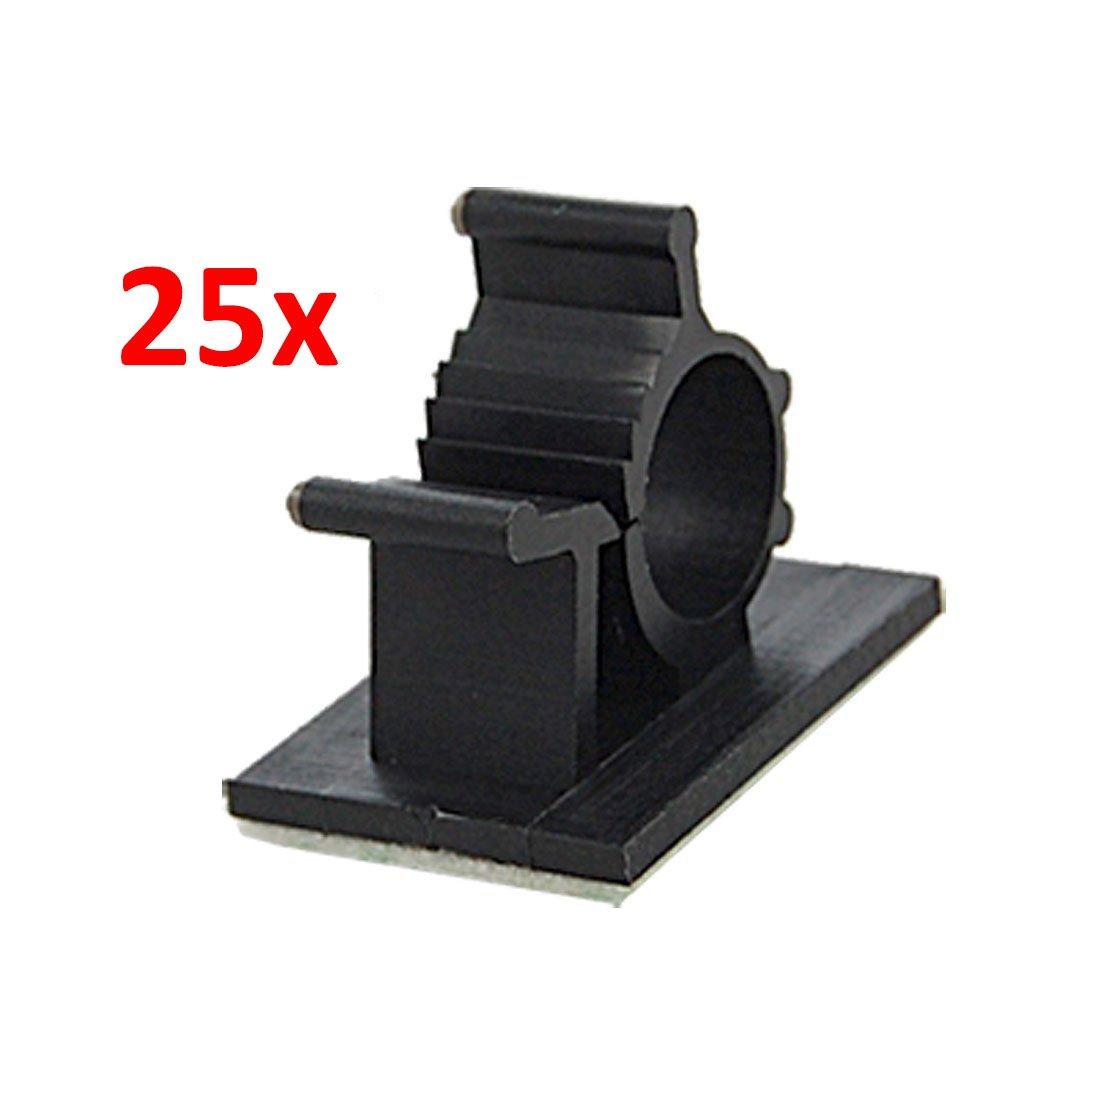 Amazon.com: 25 Pcs Black Adhesive Backed Nylon Wire Adjustable Cable ...